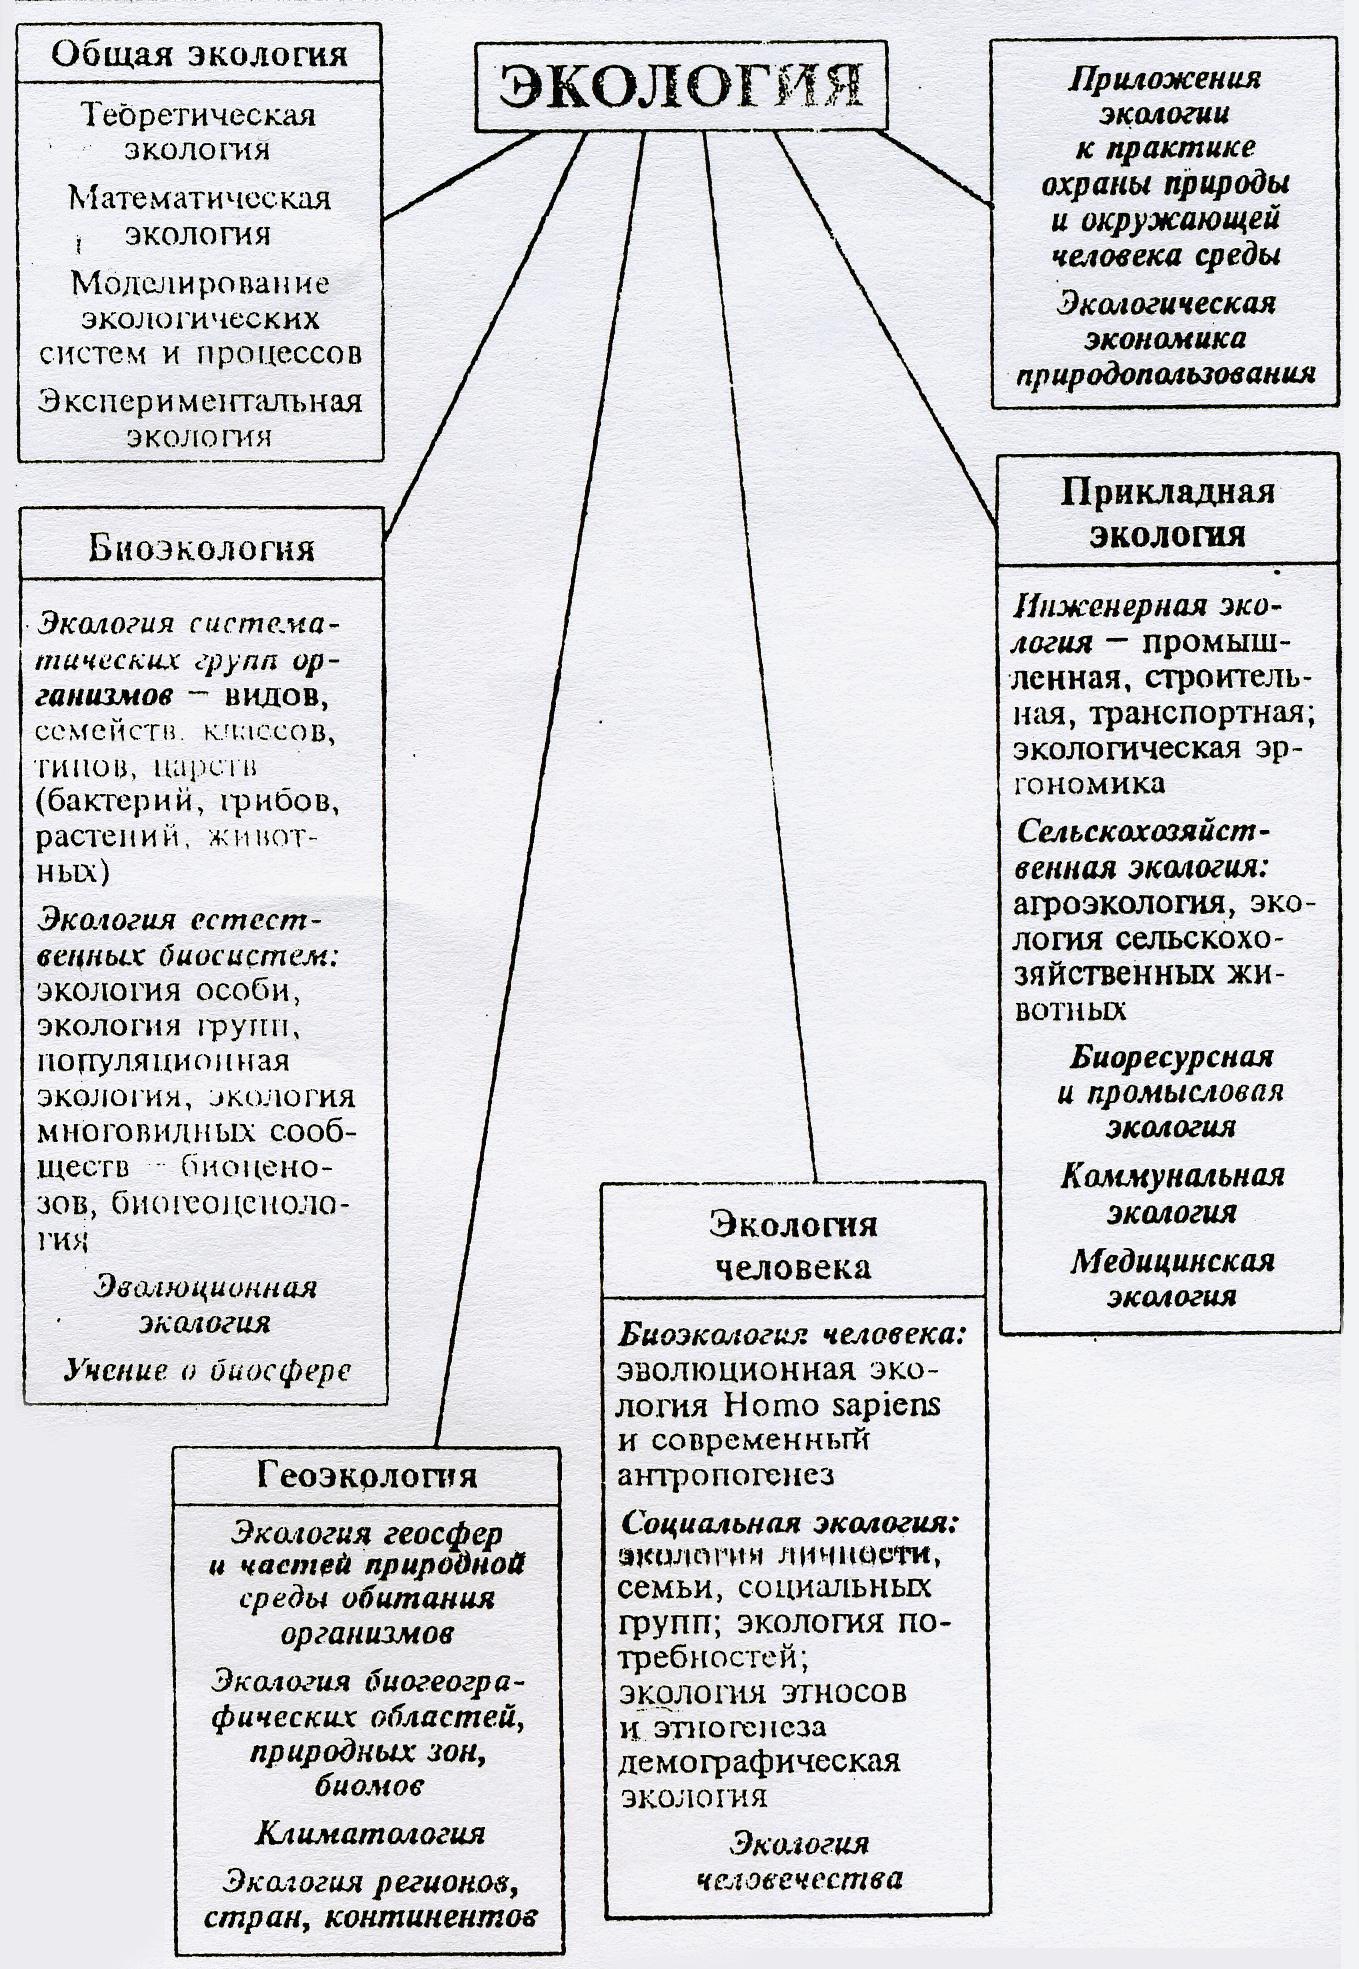 Структура макроэкологии шпаргалка